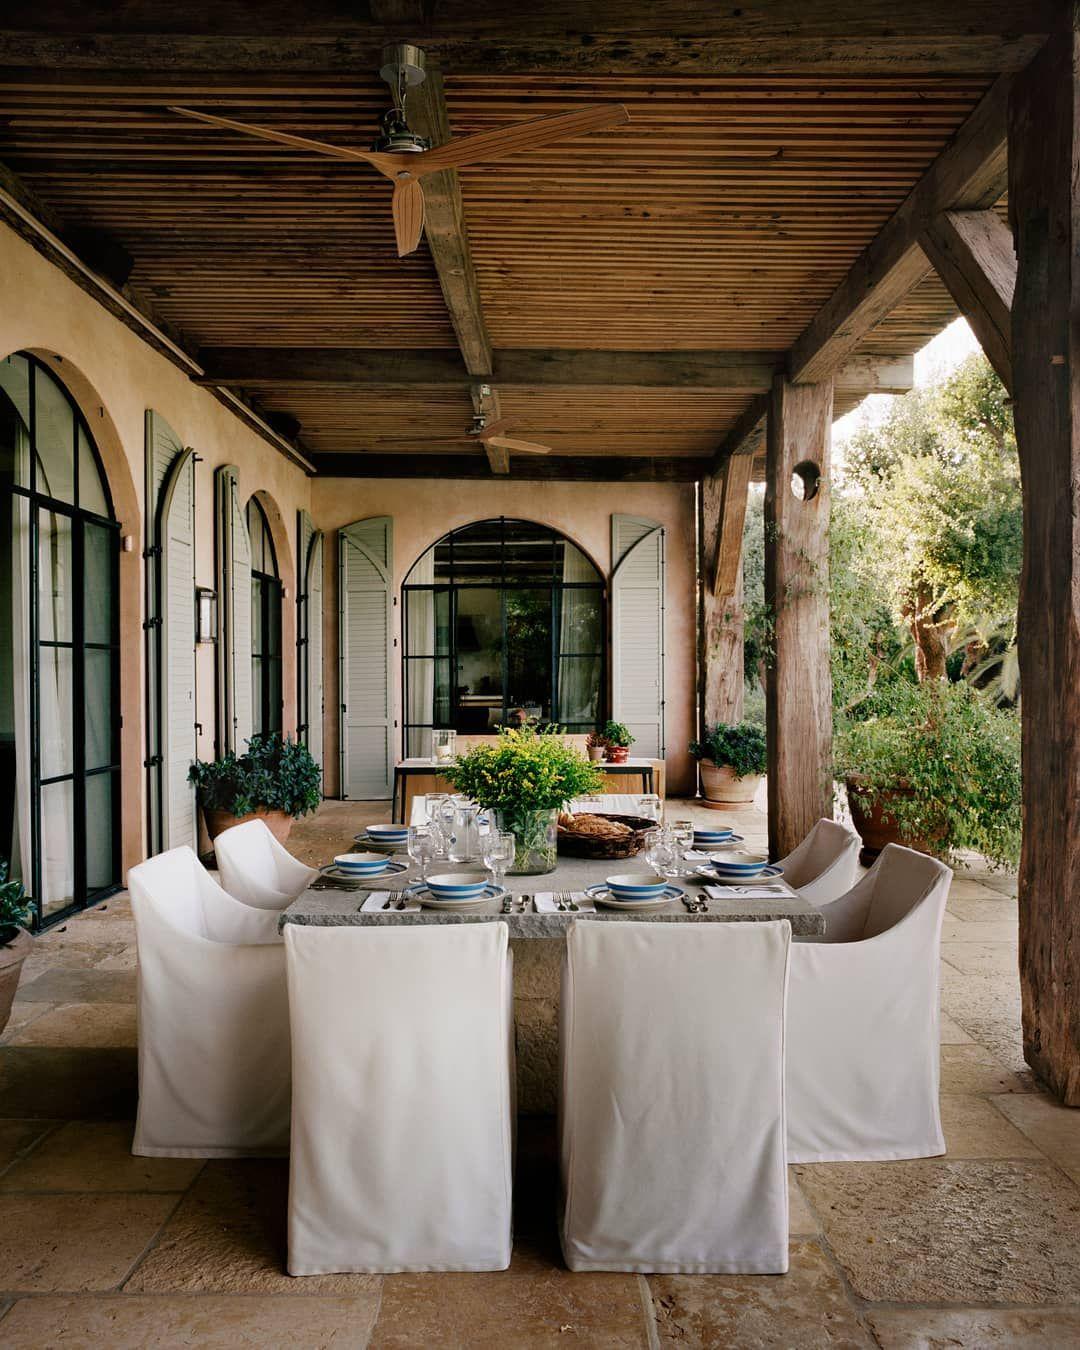 Veranda Magazine On Instagram When Texas Based Designer Kevinspearmandesign Was Enlisted To Remodel A Tuscan Style Ho Decor Boho Boffi Amenagement Interieur